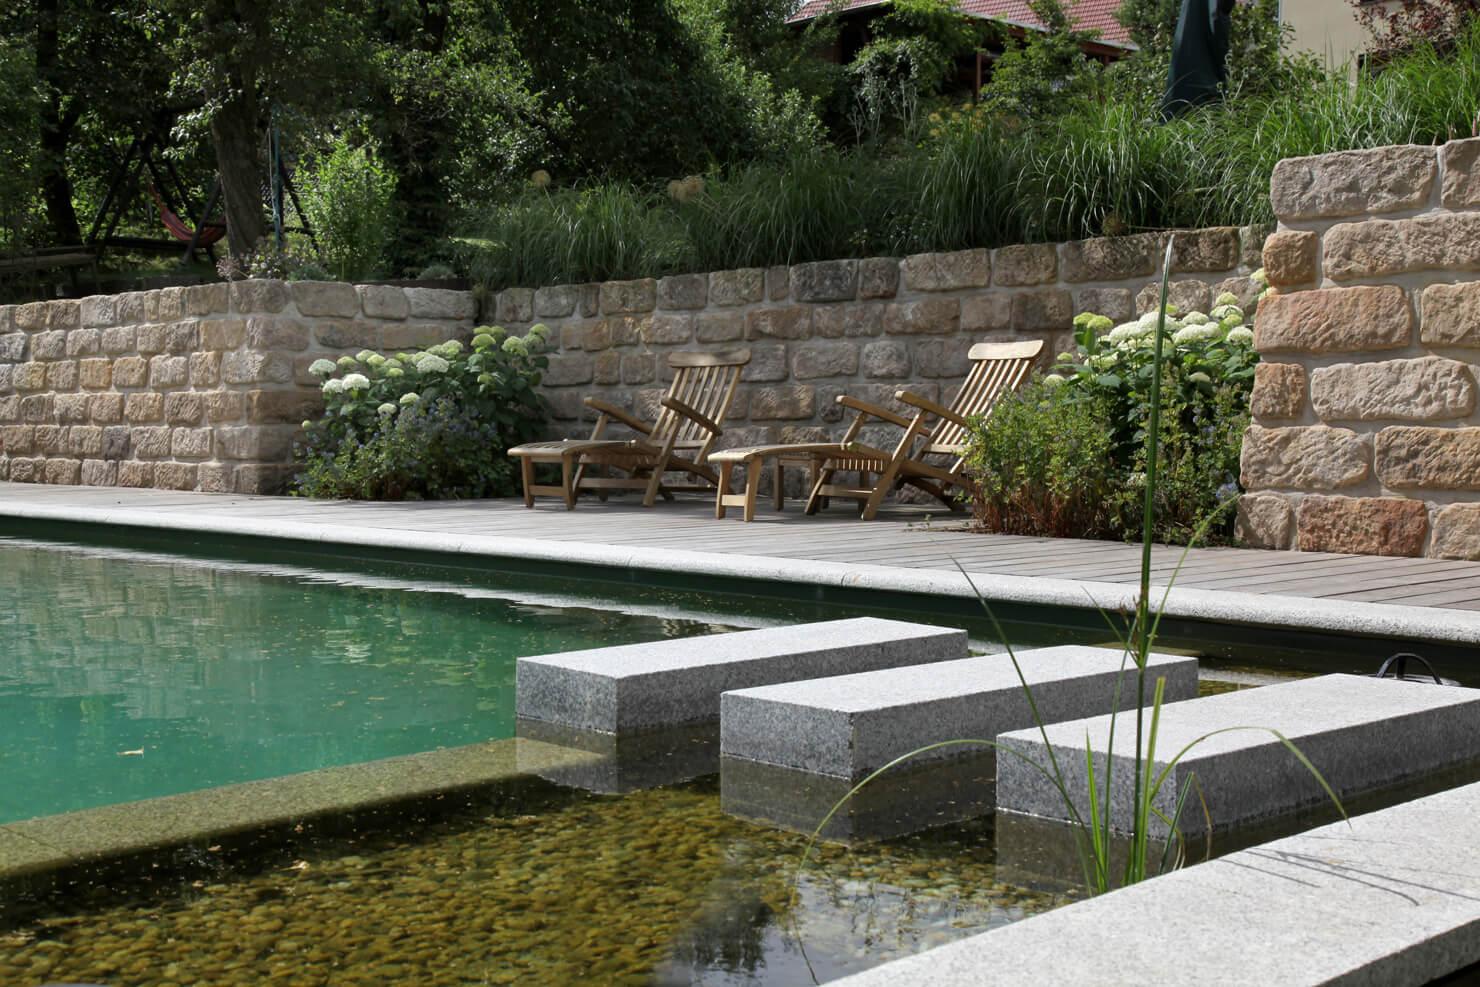 gartenmanufaktur-nuessler-garten-naturpool-pool